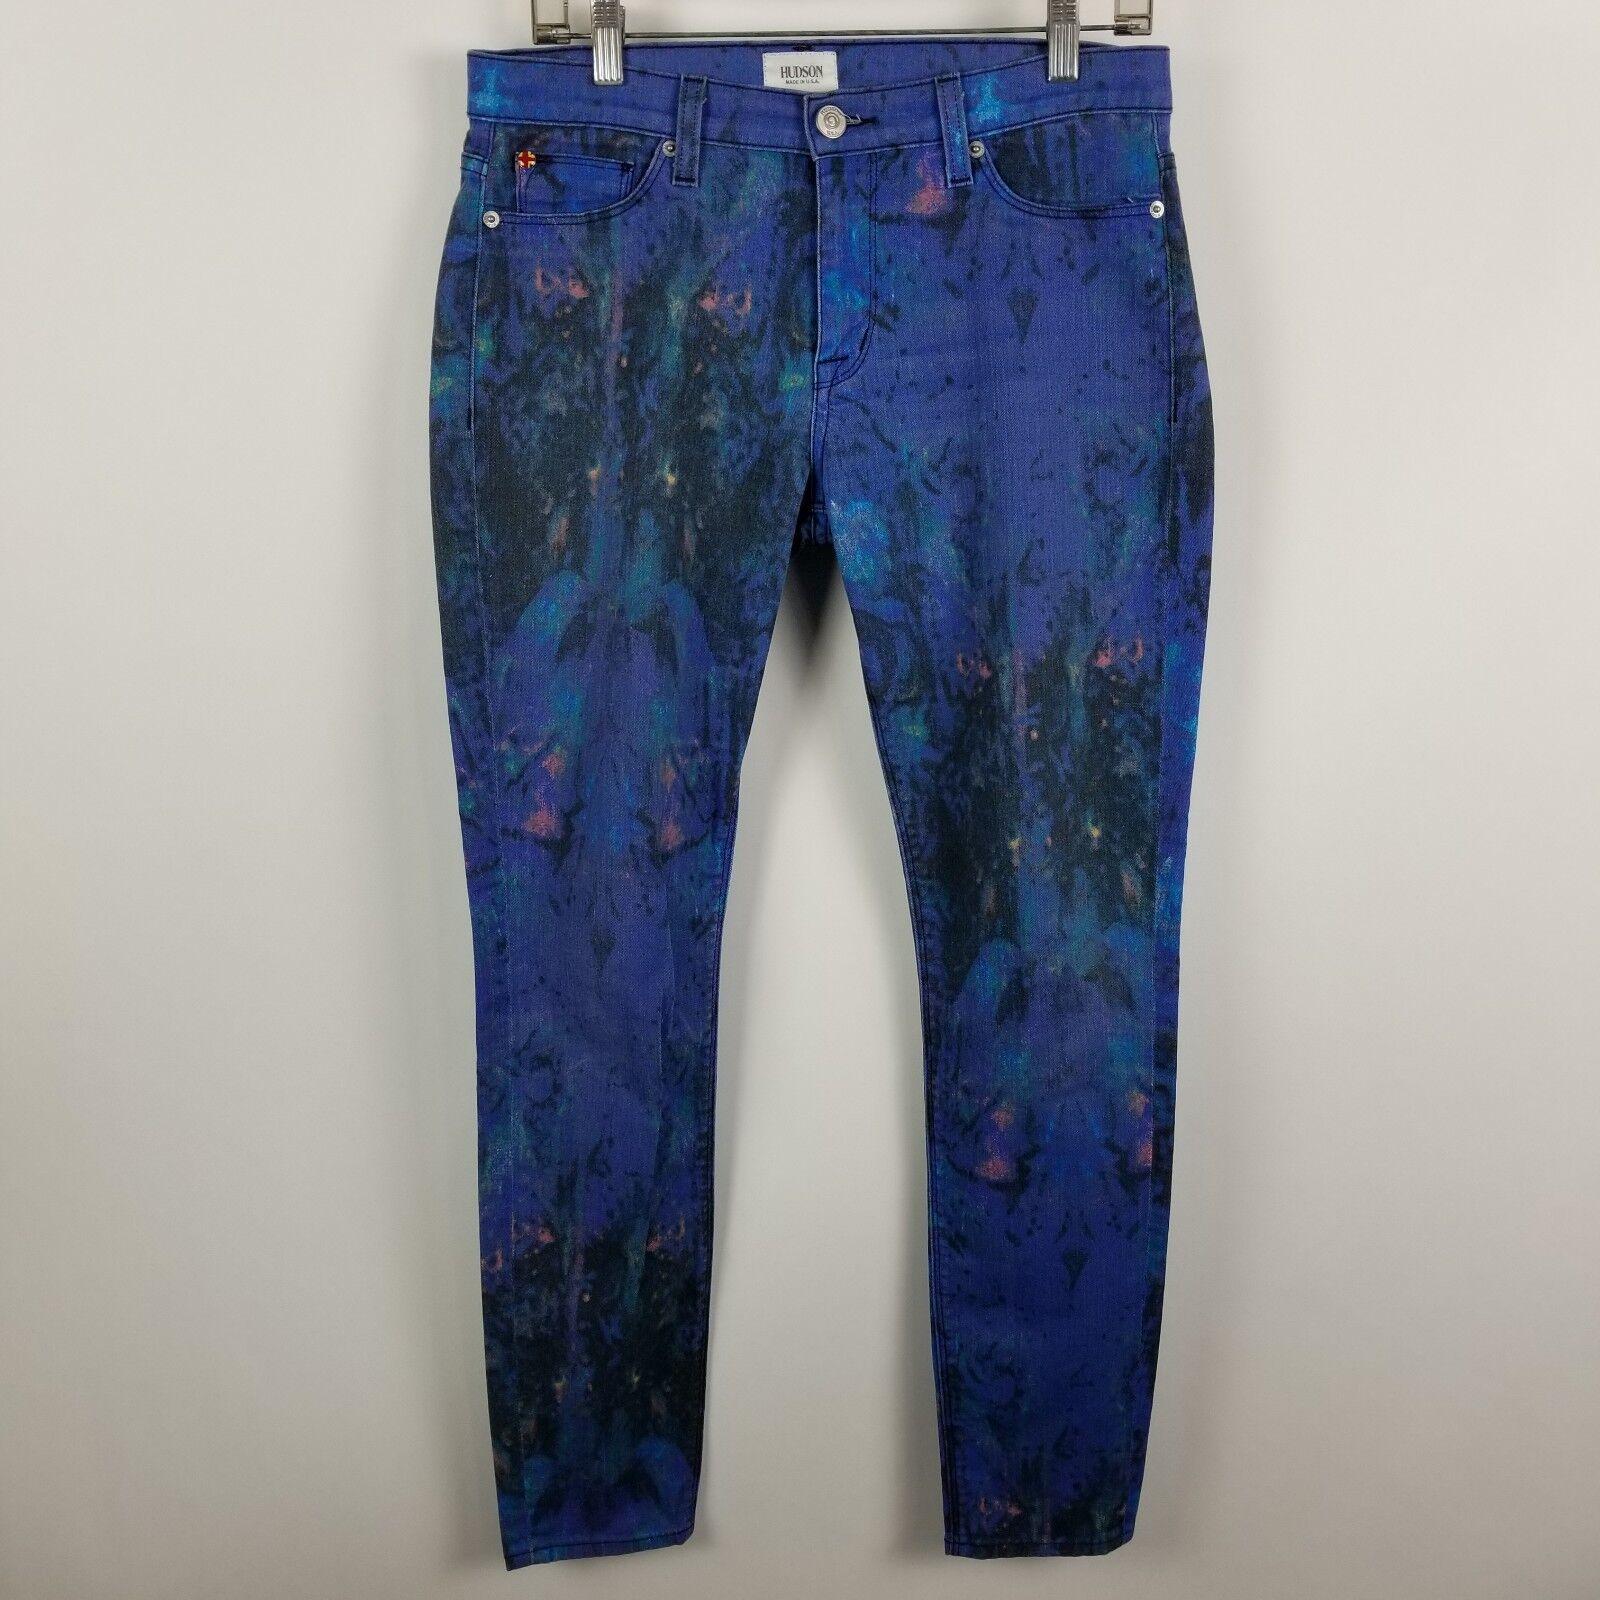 Hudson Jeans Skinny Womens bluee Jeans Size 28